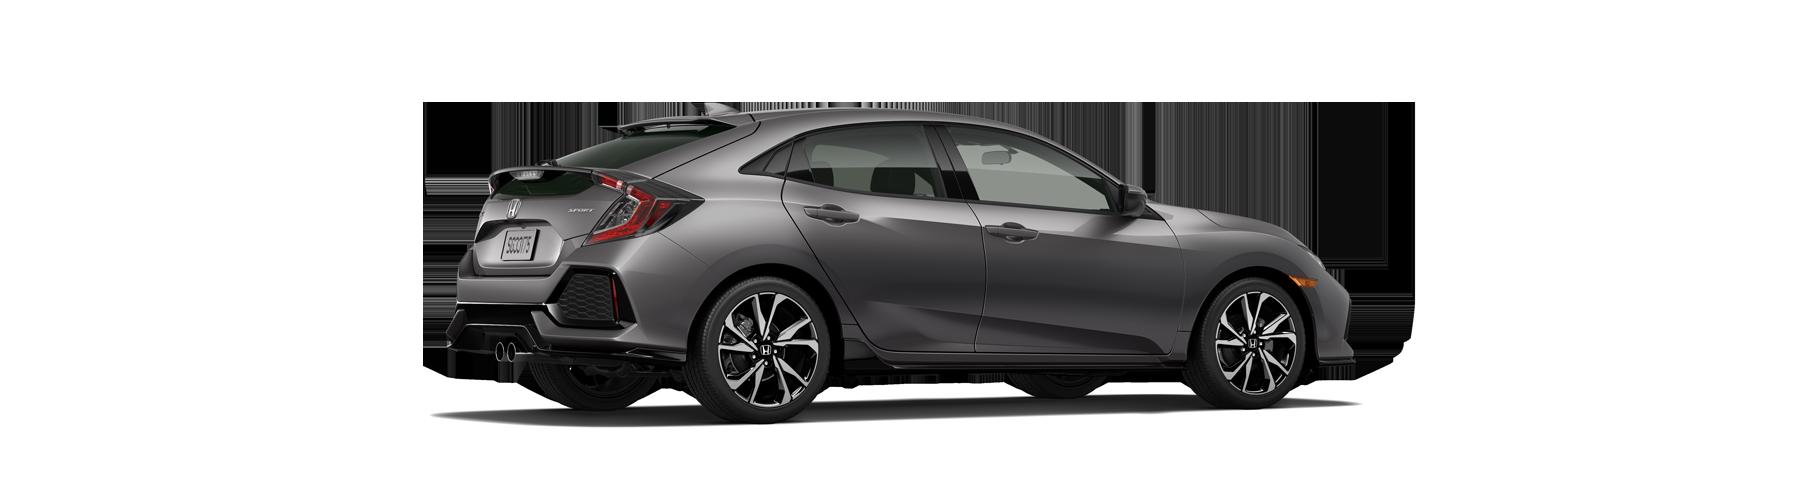 2017 Honda Civic Hatchback Rear Angle